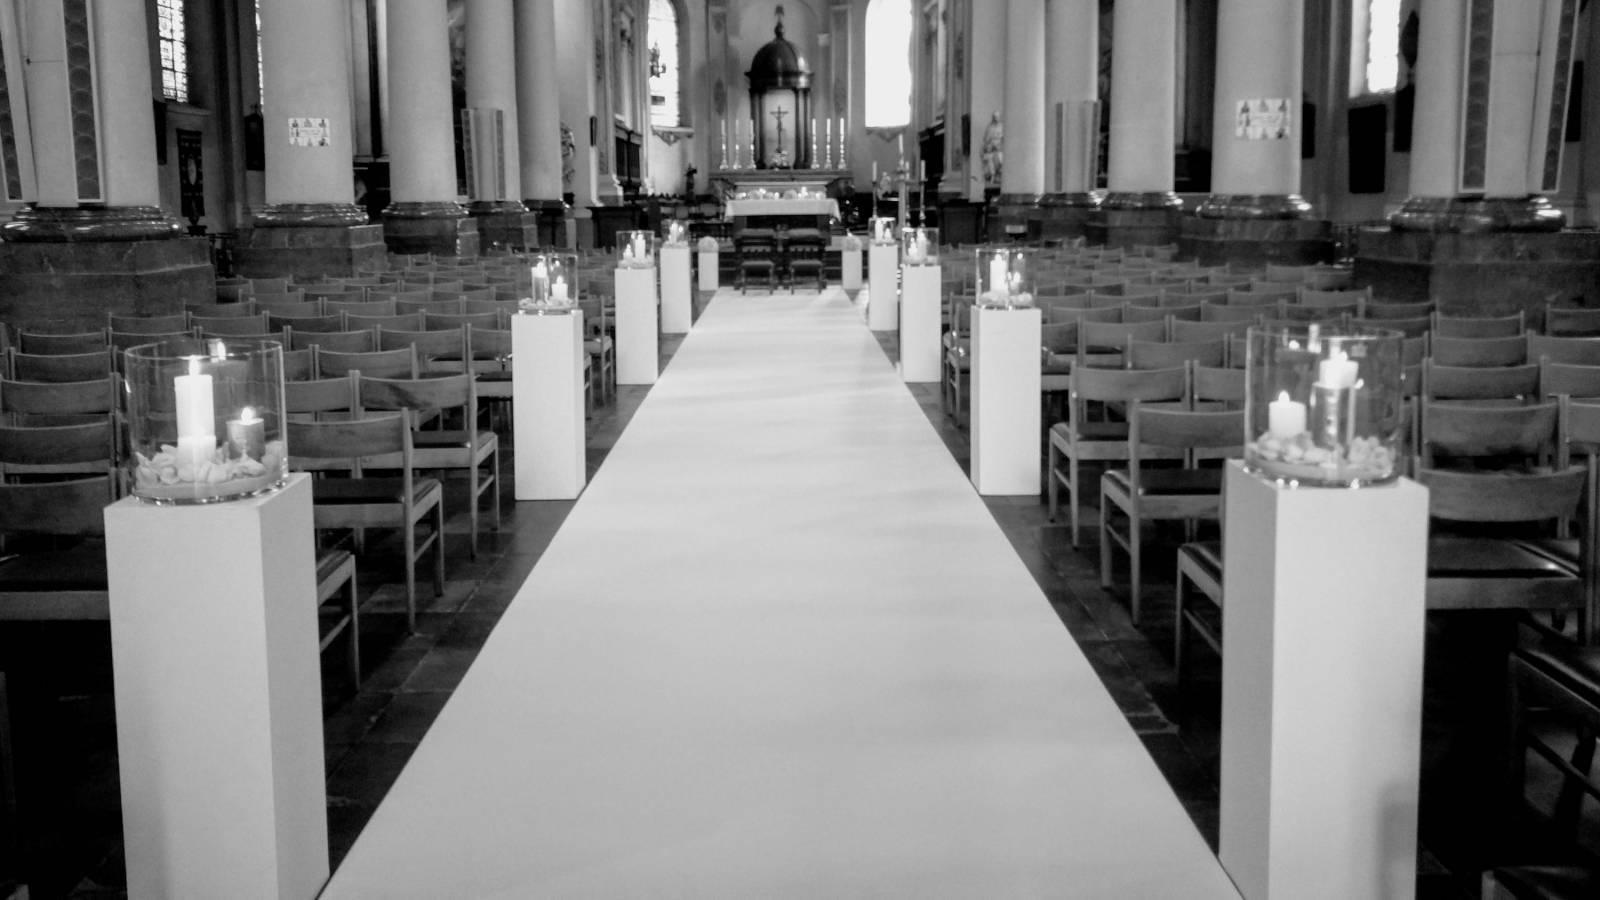 Lamont Ceremonie - Ceremonie - Eigen Foto's - House of Weddings - 4